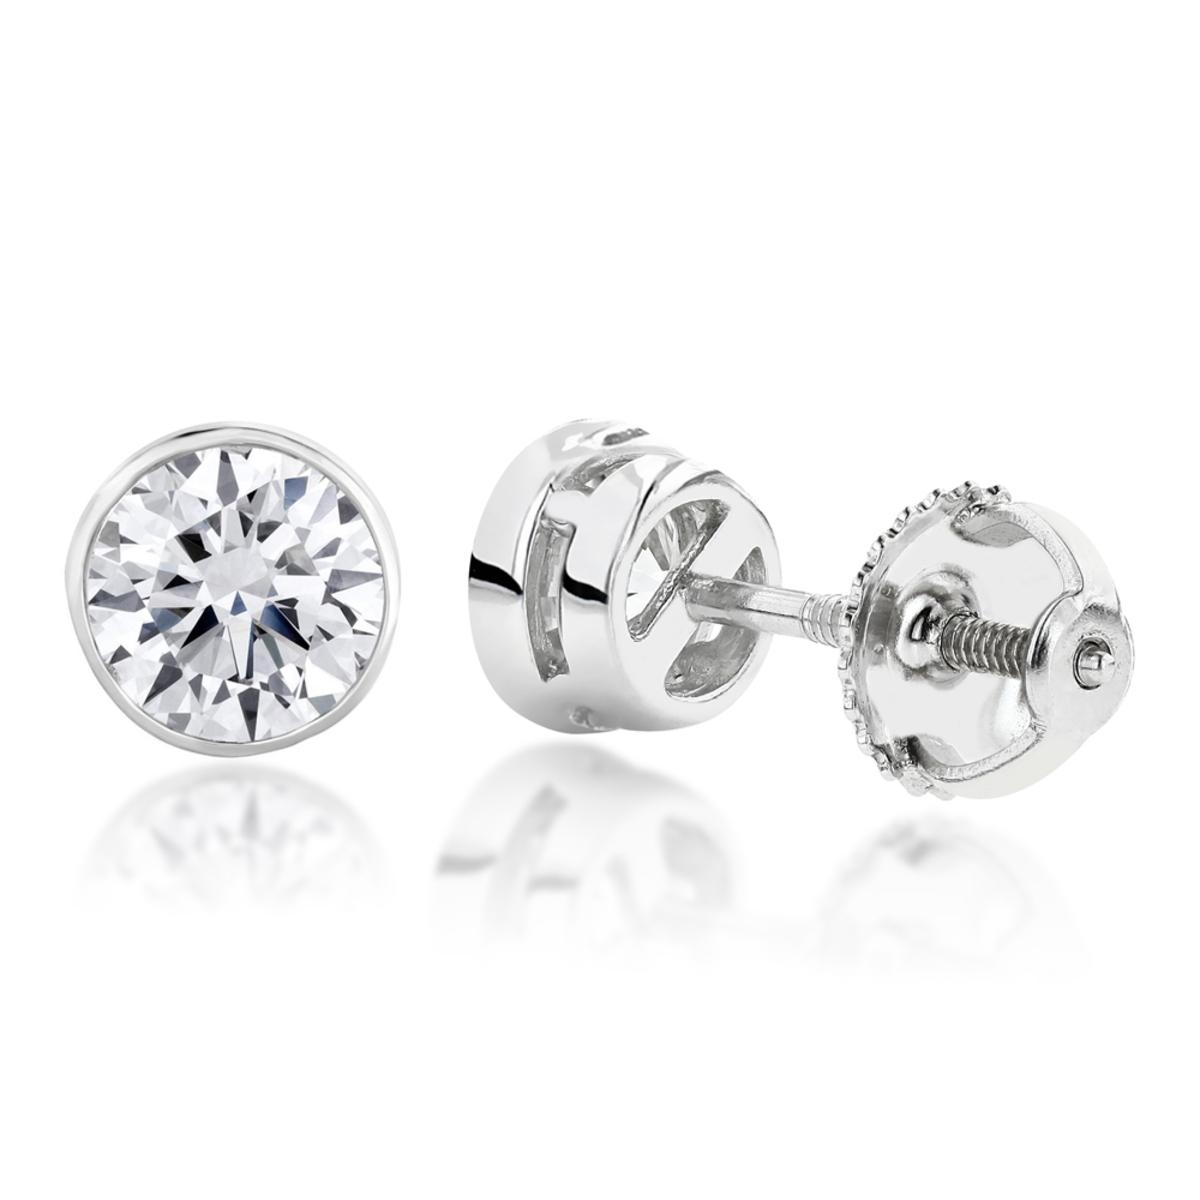 18K Gold Solitaire Round Diamond Bezel Stud Earrings 1.5ct